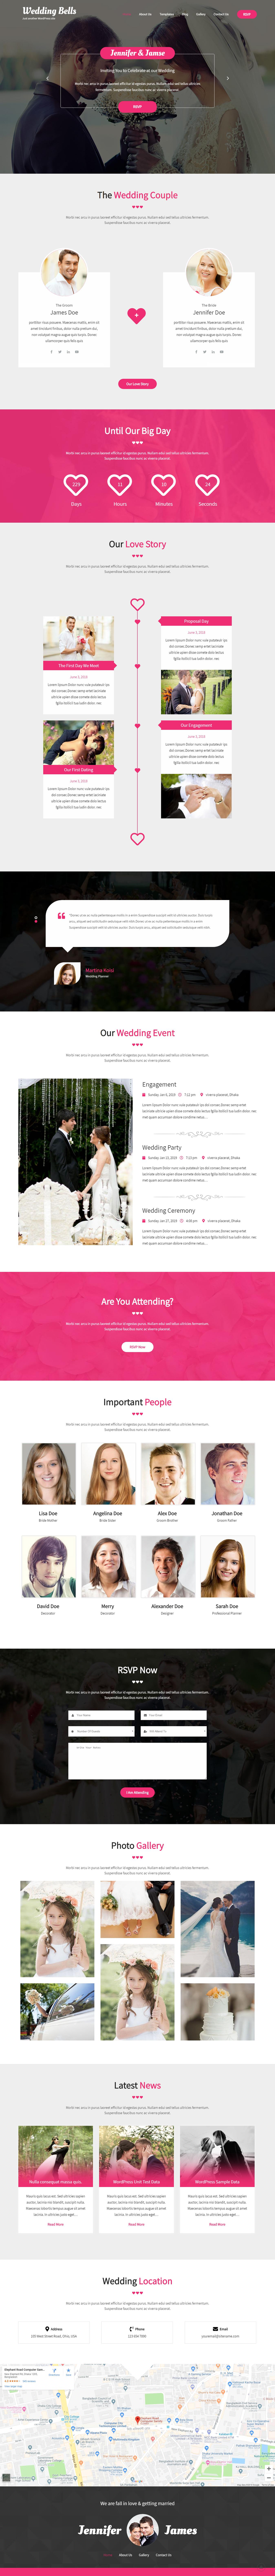 wedding bells best free wedding wordpress theme - 10+ Best Free Wedding WordPress Themes